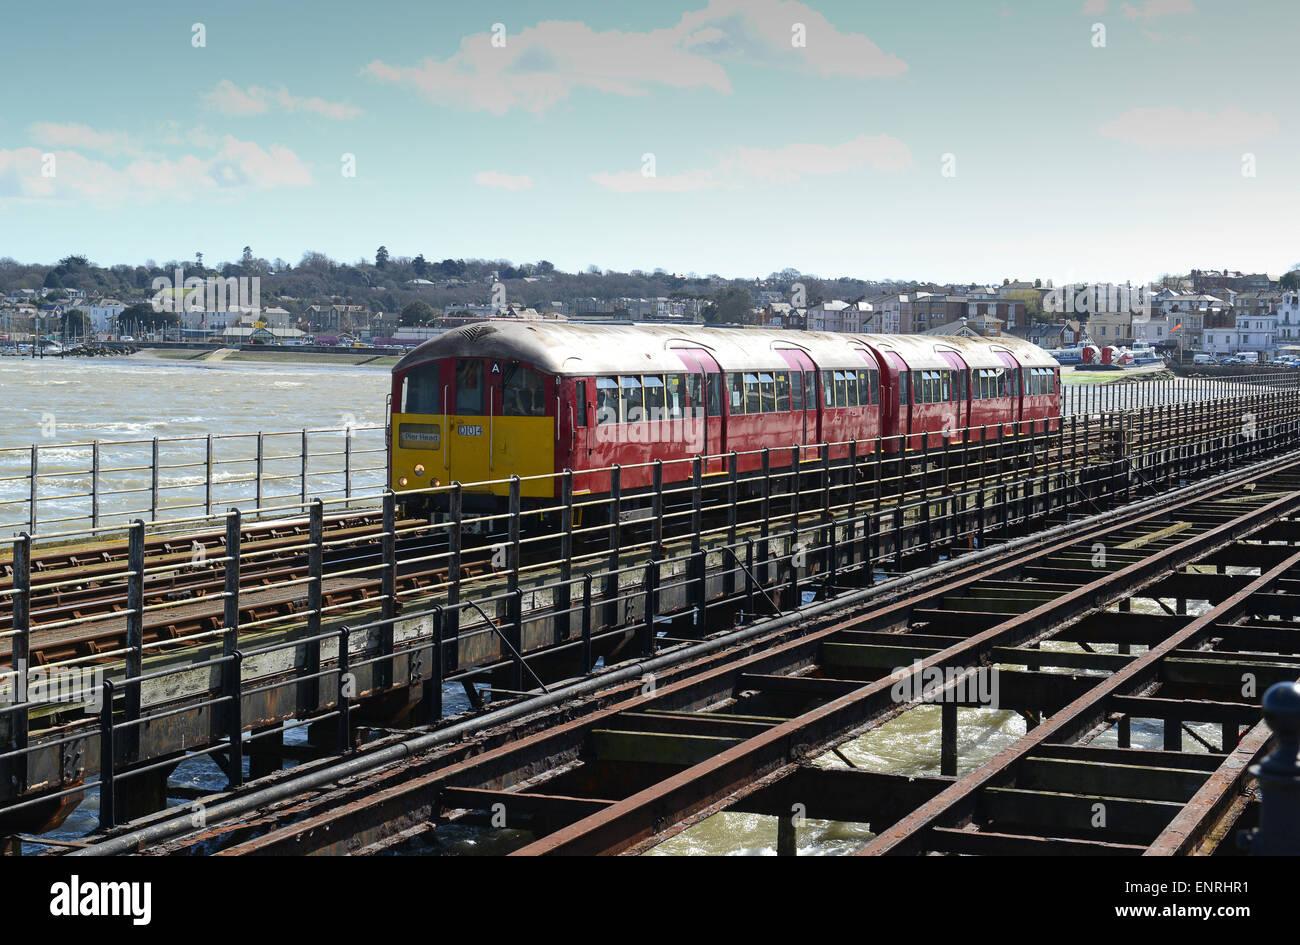 Ryde Pier Eisenbahn Zug Züge ehemaligen Londoner U-Bahn u-Bahn Isle Of Wight Stockfoto